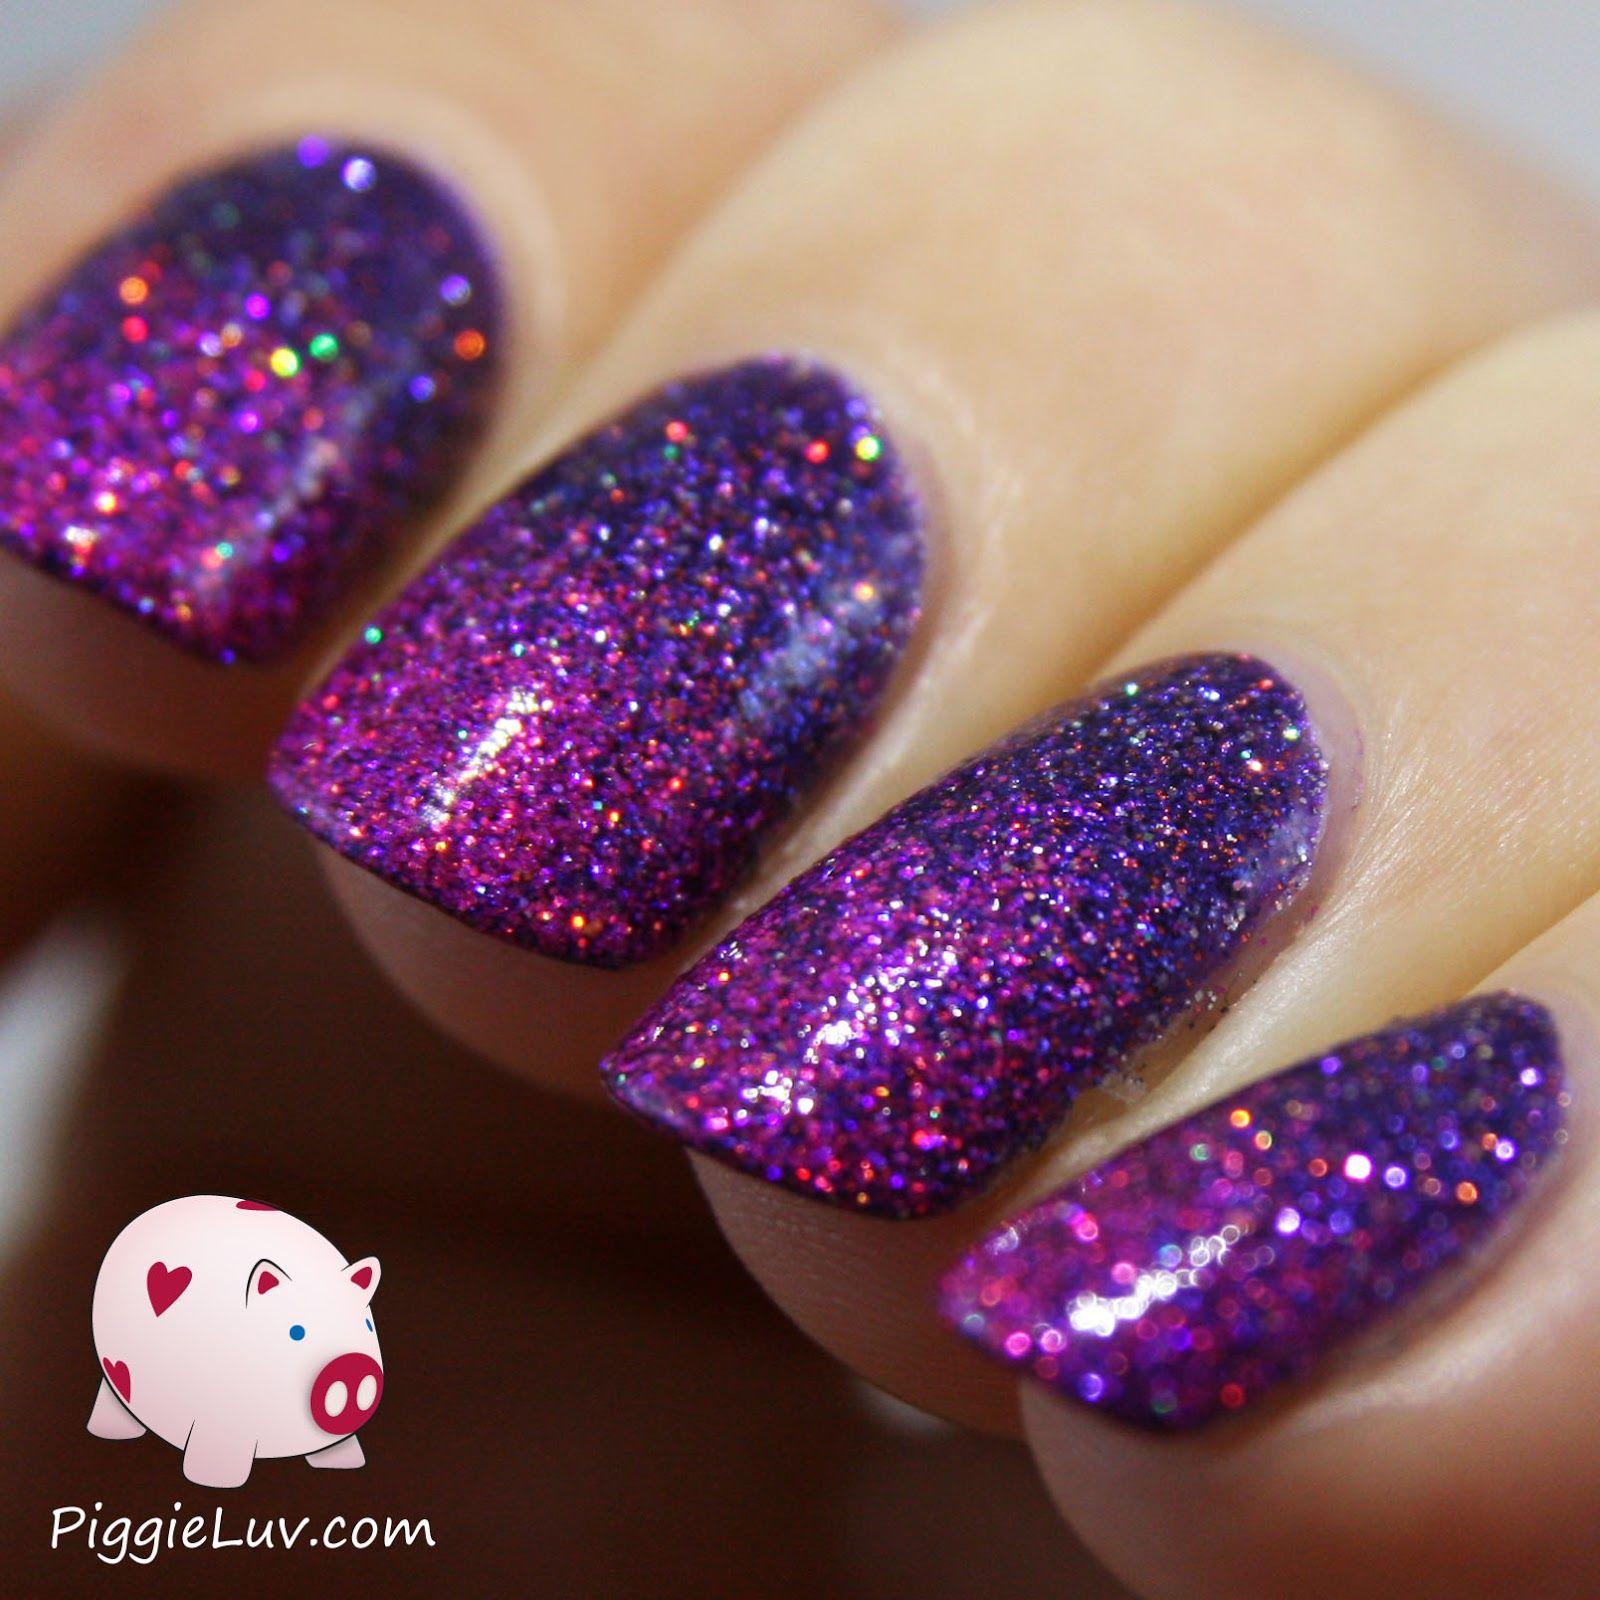 Piggieluv Rainbow Bubbles Nail Art: Glitter Gradient With Girly Bits